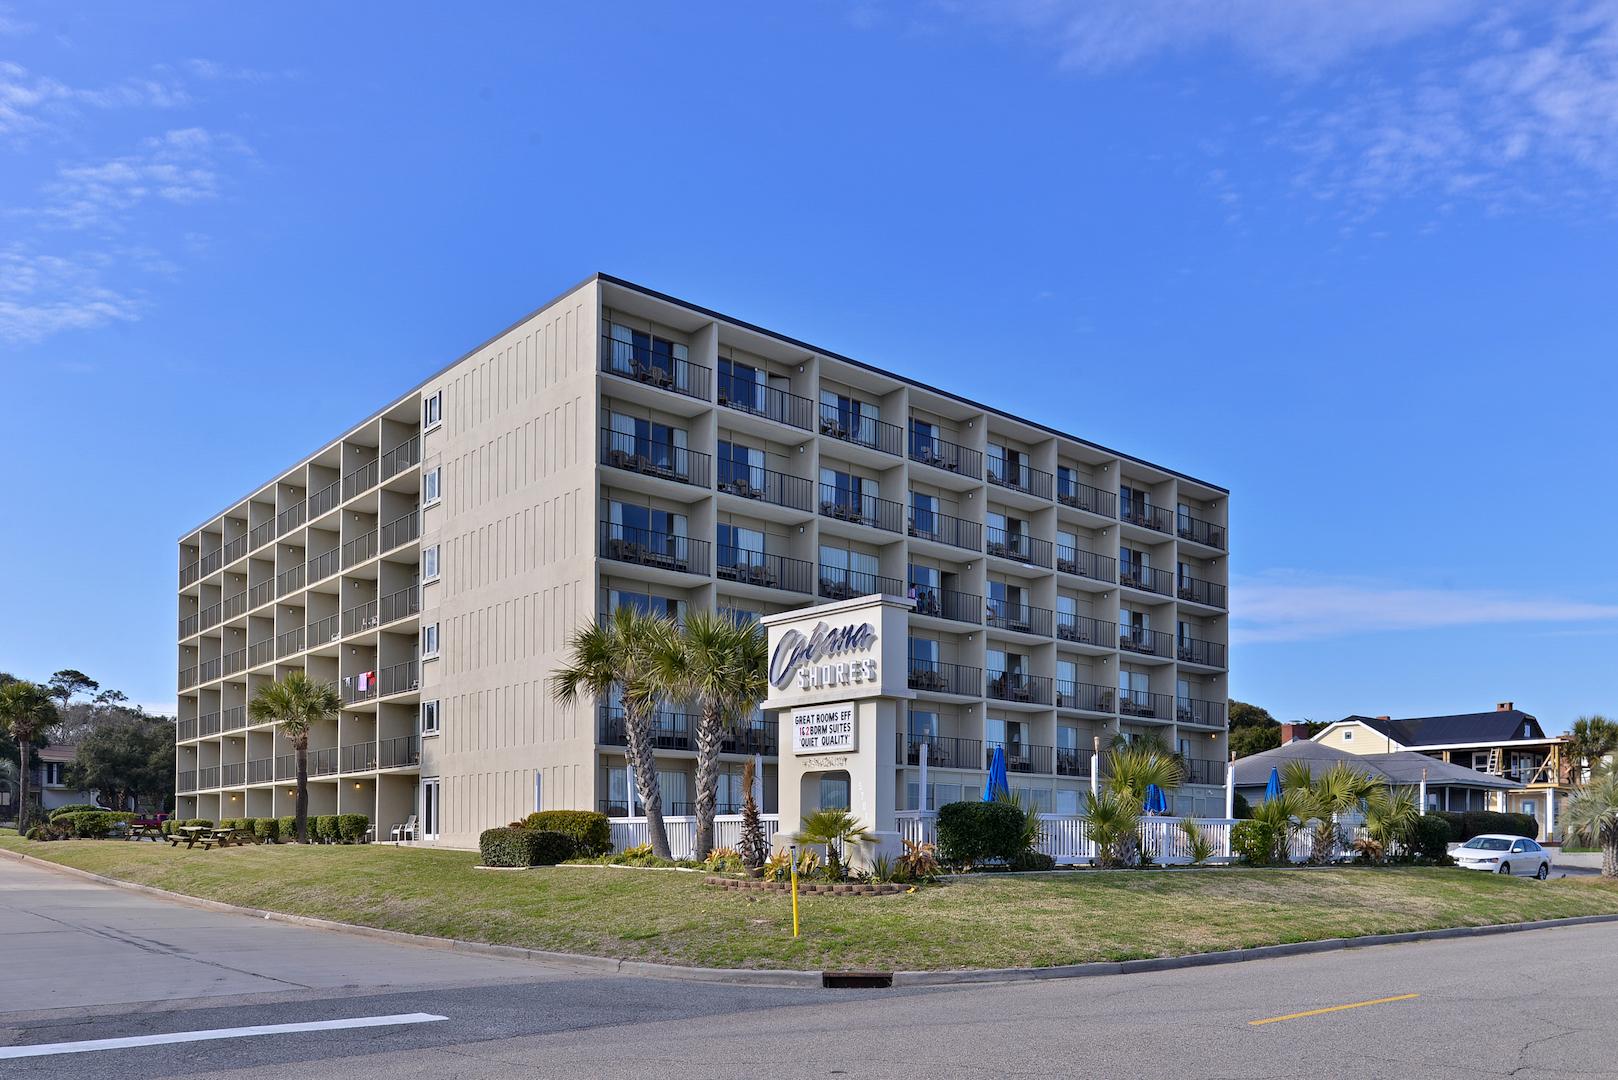 Cabana Ss Hotel Myrtle Beach Hotels Near State Park